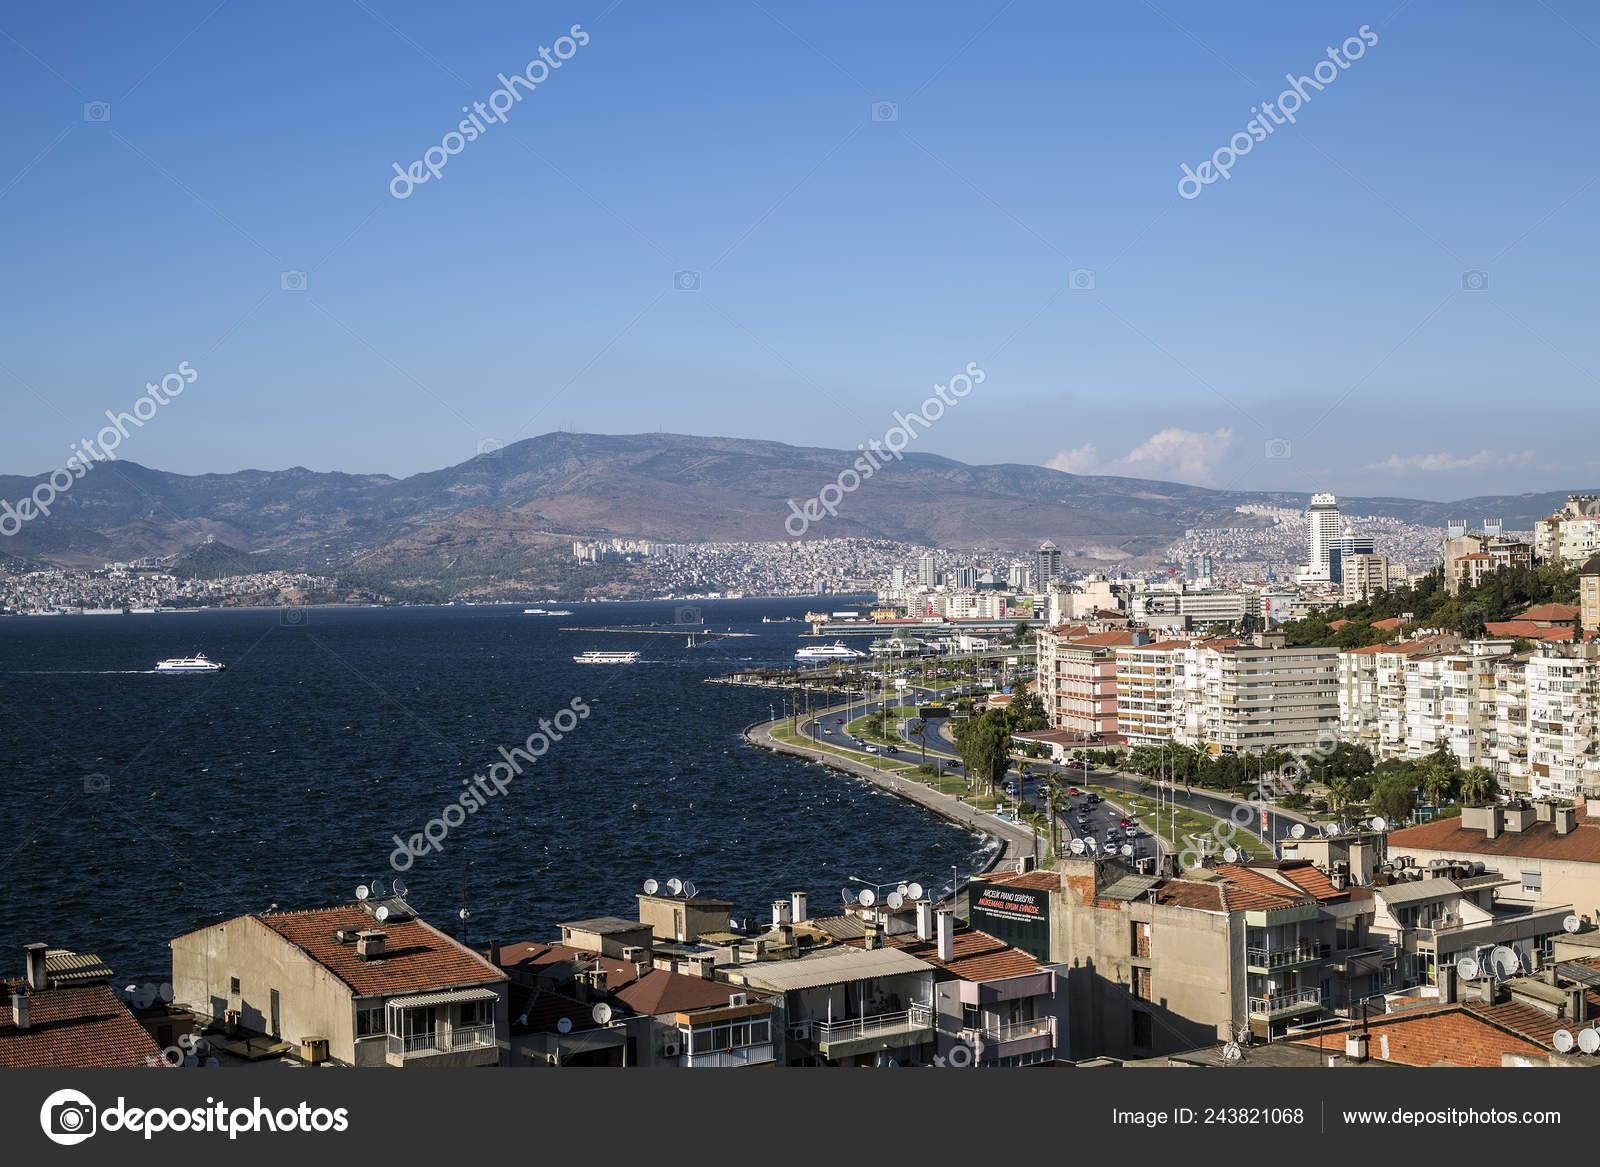 Travel Concept Photo Turkey Izmir Konak Kordon Stock Photo C Esindeniz 243821068